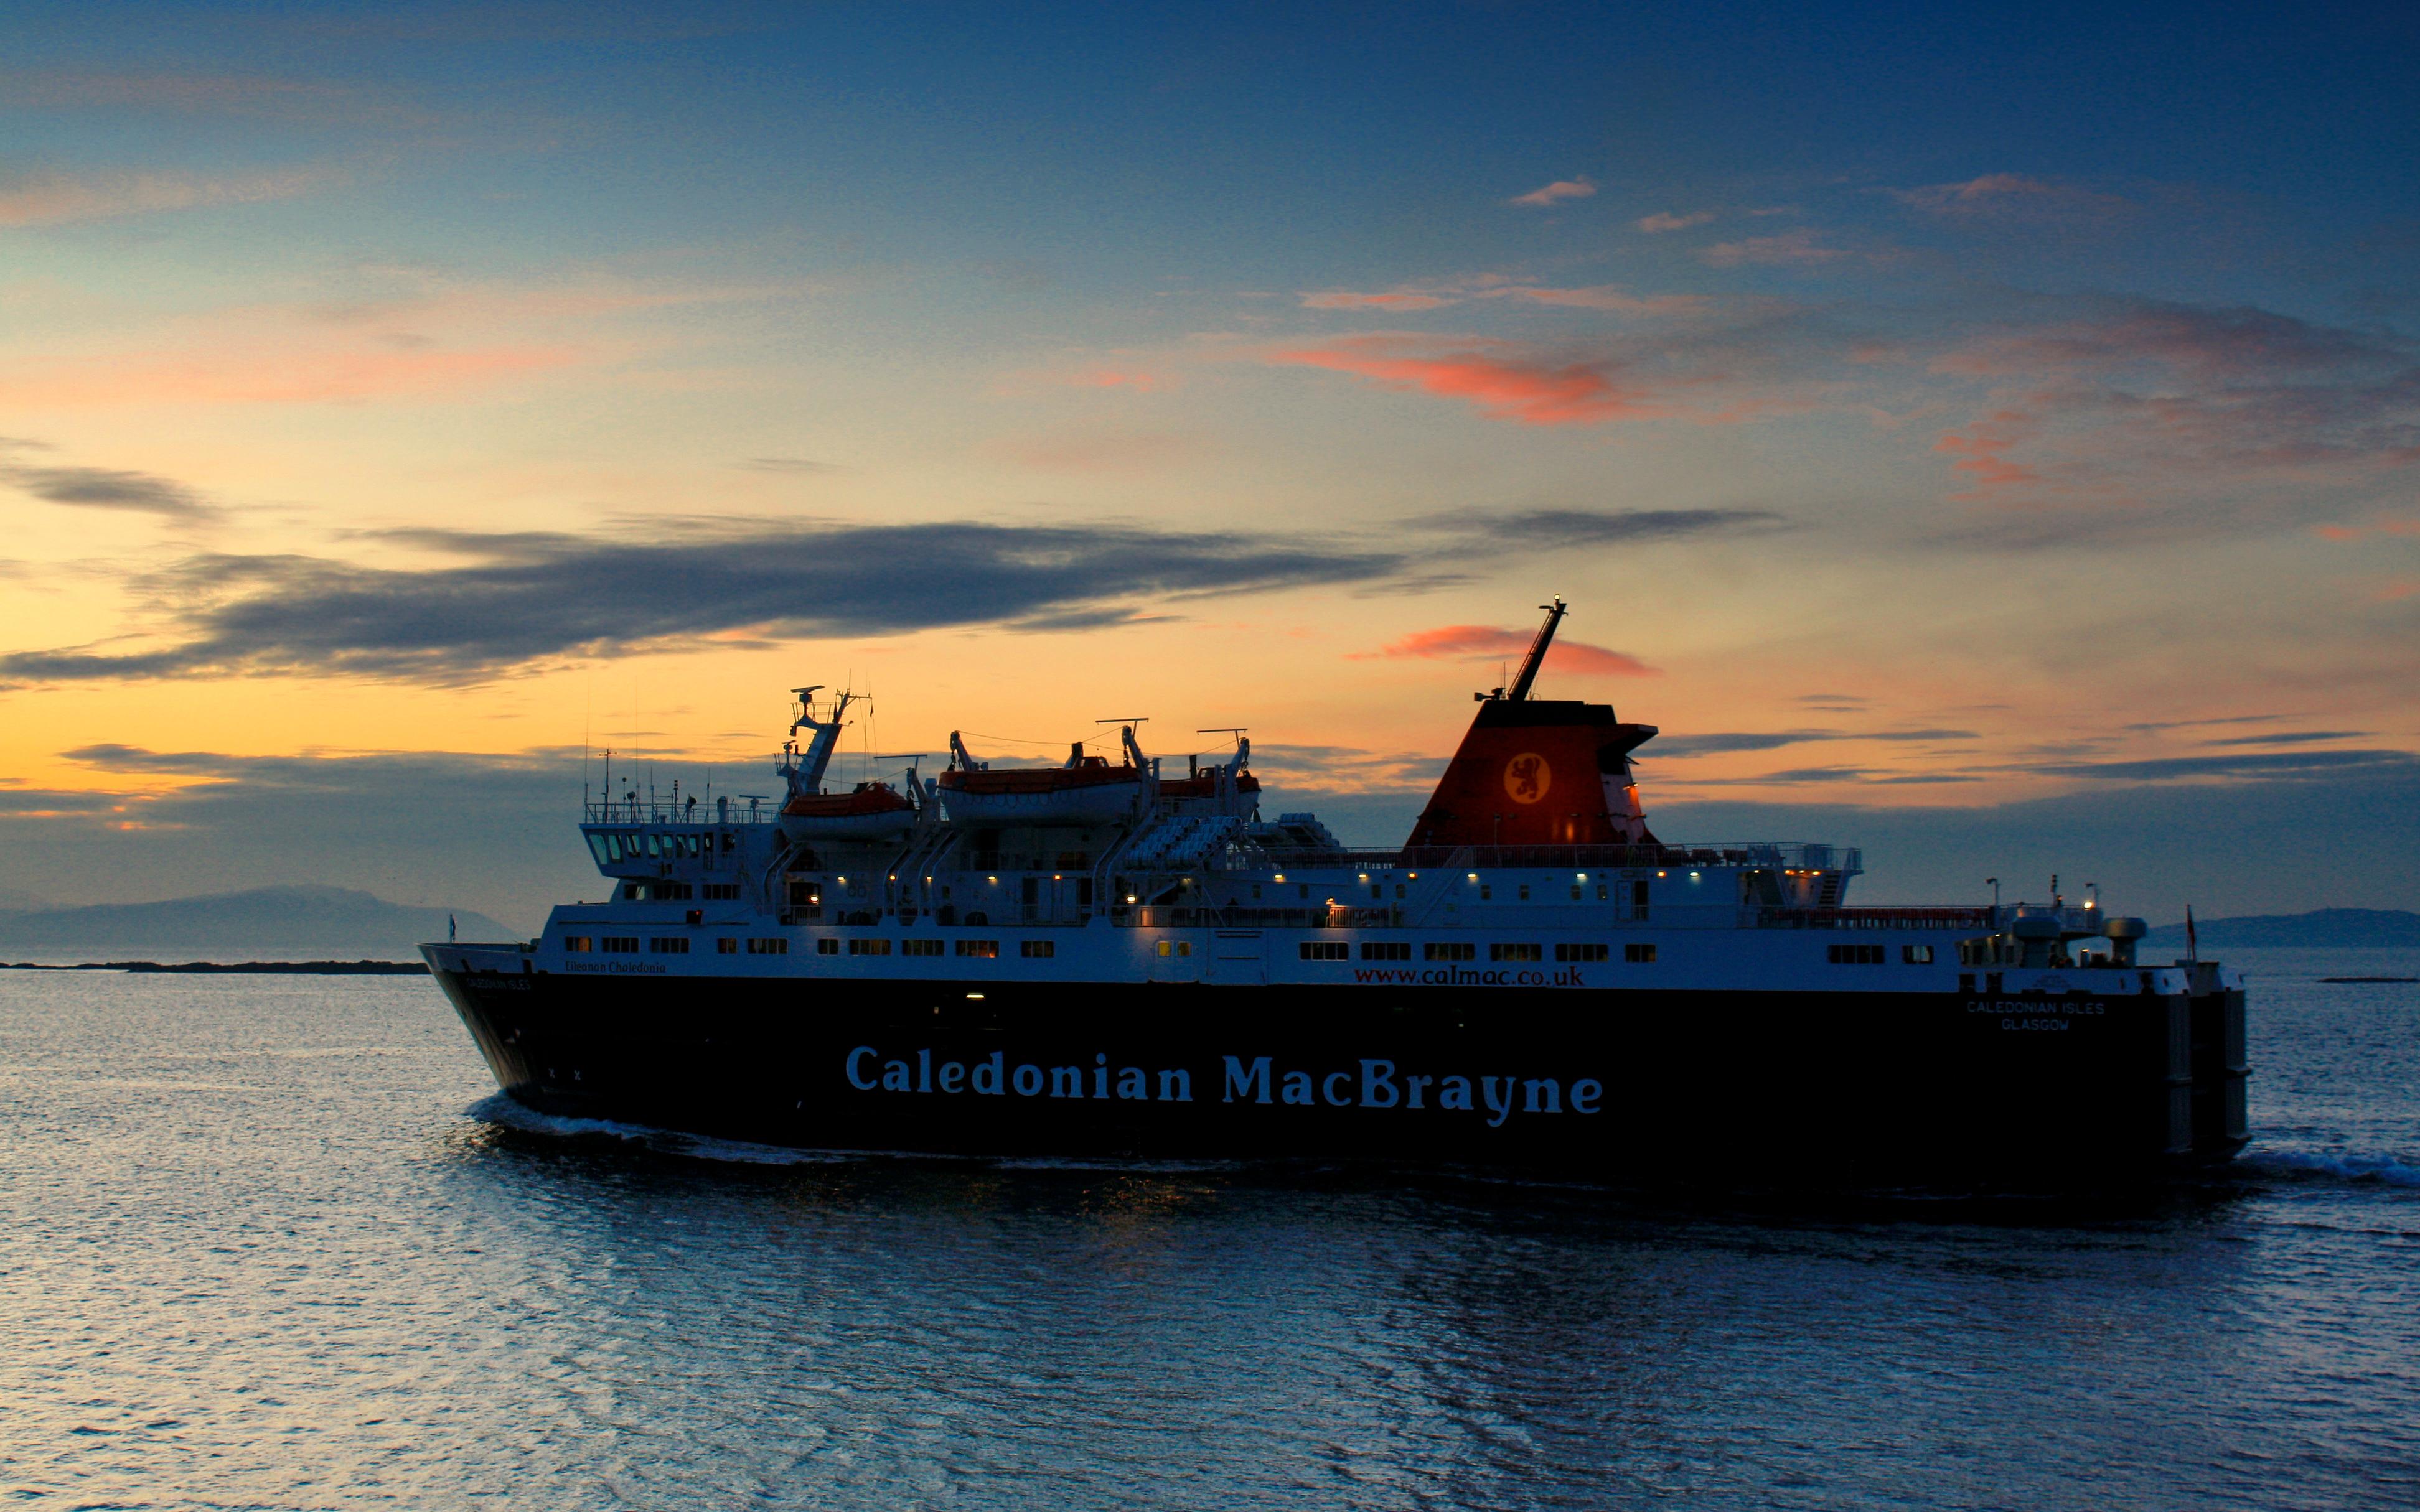 Caledonian Isles leaving Ardrossan at sunset (Ships of CalMac)